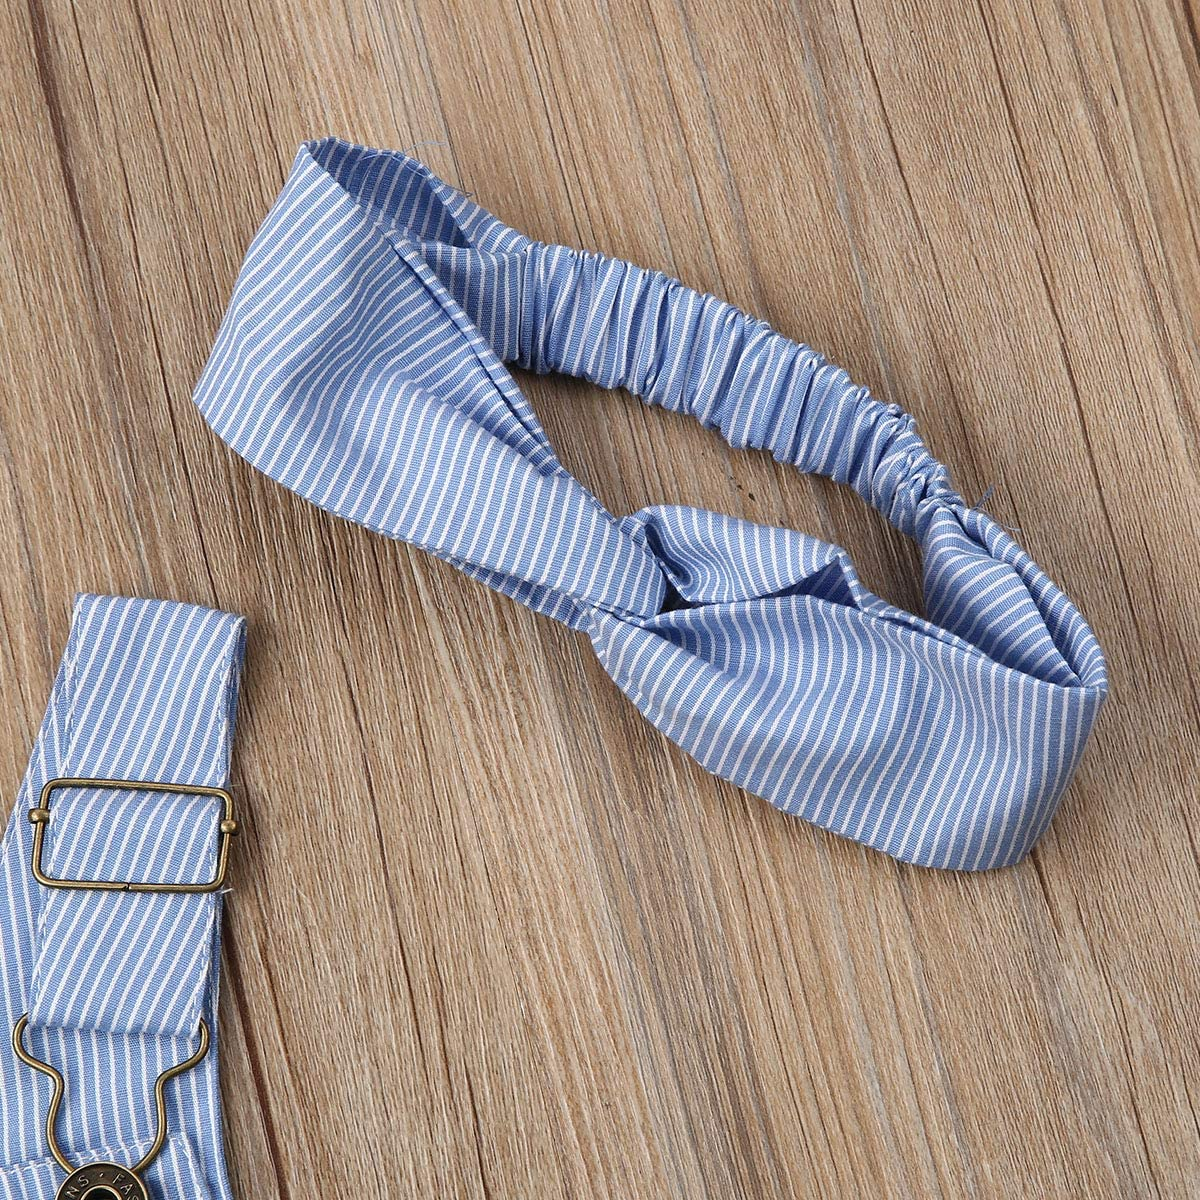 Liyamiee Toddler Baby Girl Boy Matching Outfits Bule Striped Suspender Bib Pants Overalls Strap Suspender Dress Headband